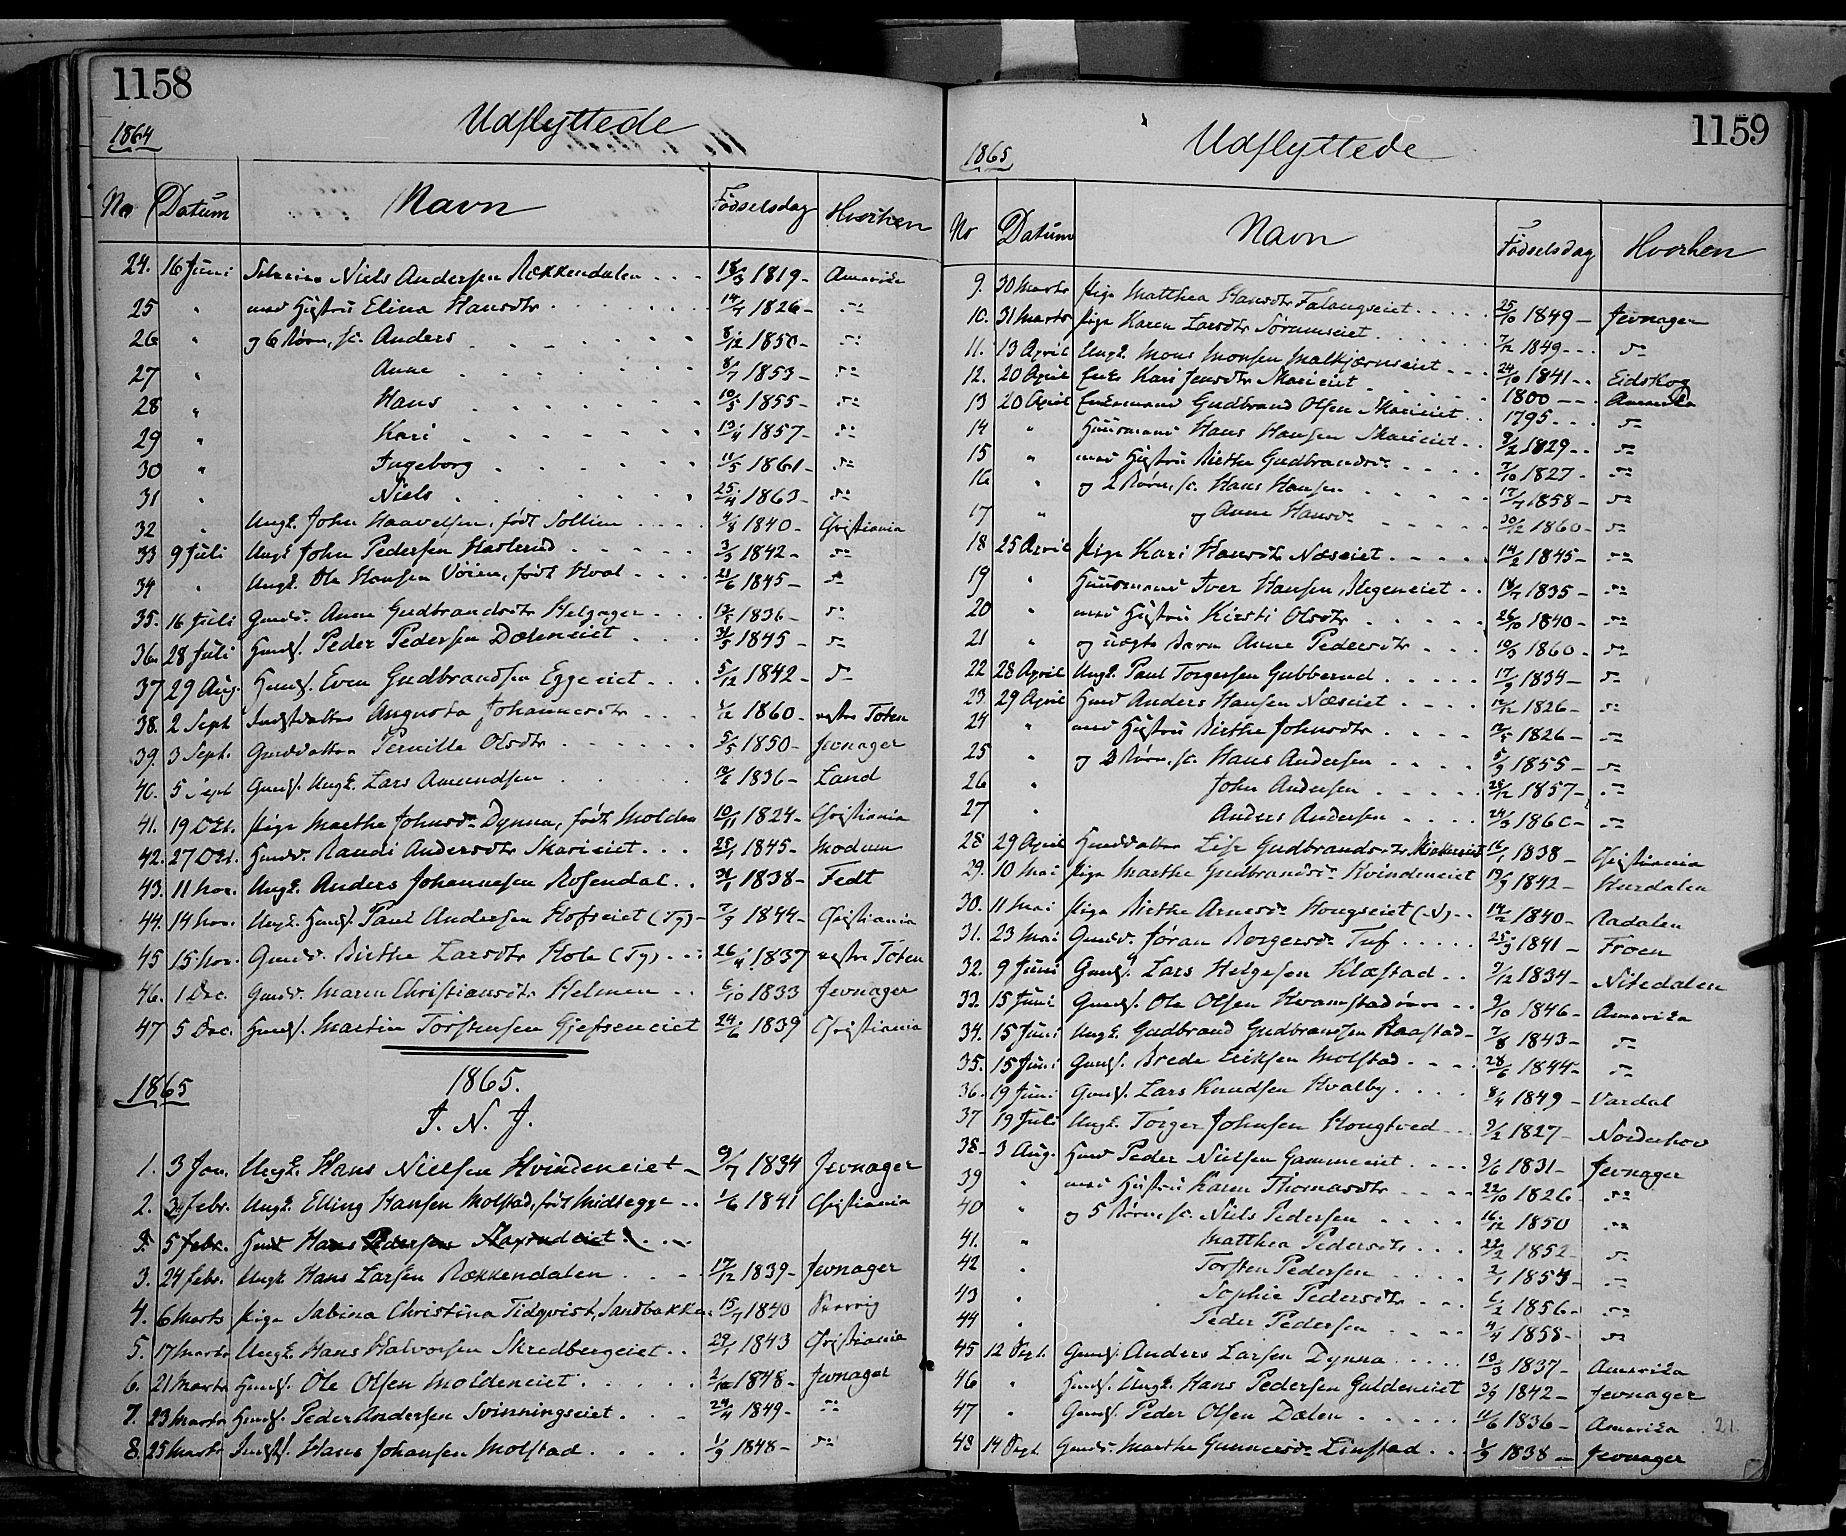 SAH, Gran prestekontor, Ministerialbok nr. 12, 1856-1874, s. 1158-1159